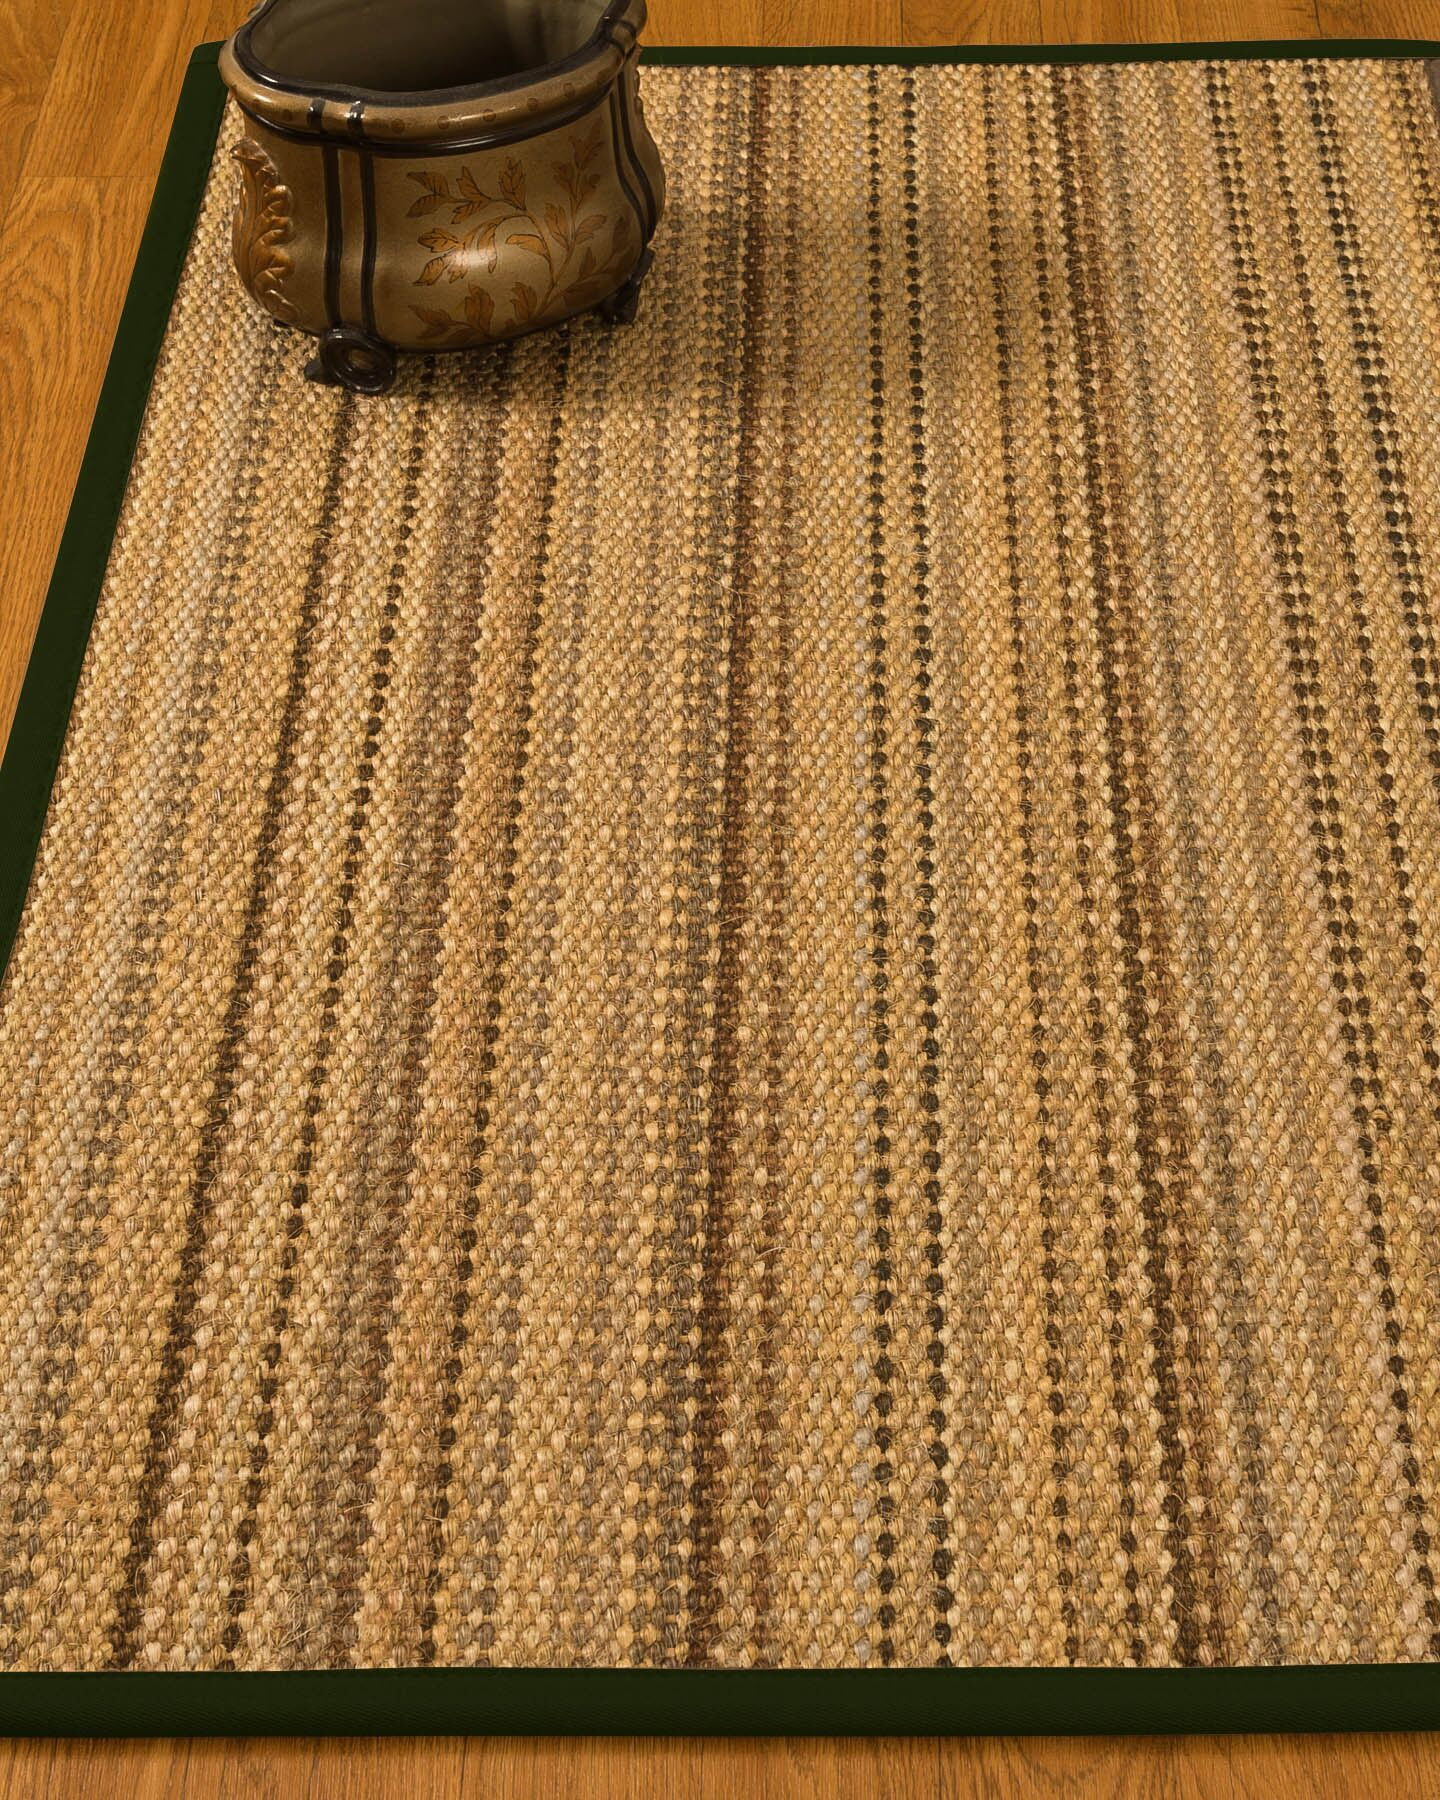 Kimmel Hand-Woven Beige Area Rug Rug Size: Rectangle 4' x 6'